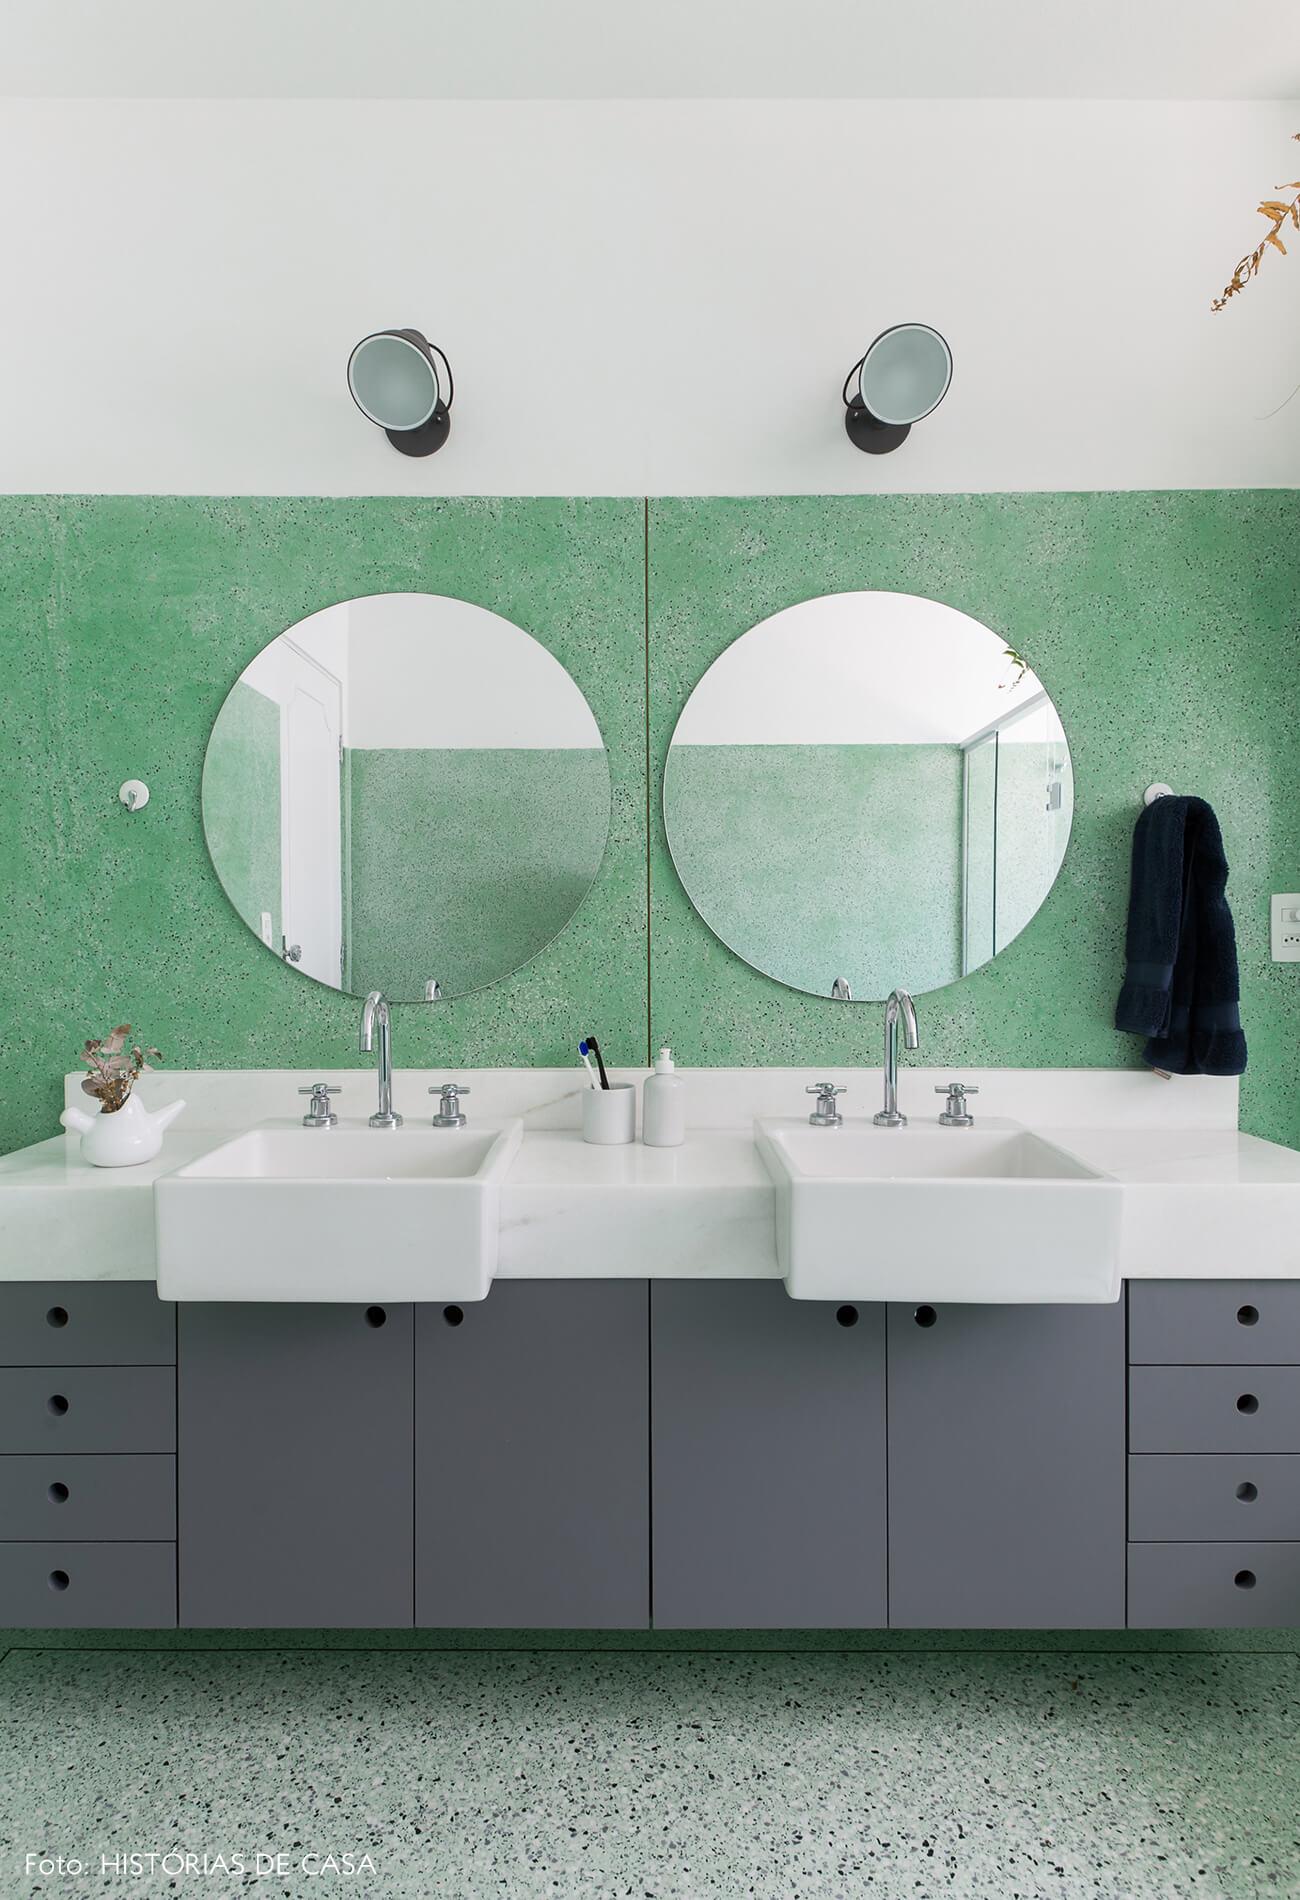 Banheiro com piso e paredes de granilite verde, green terrazzo